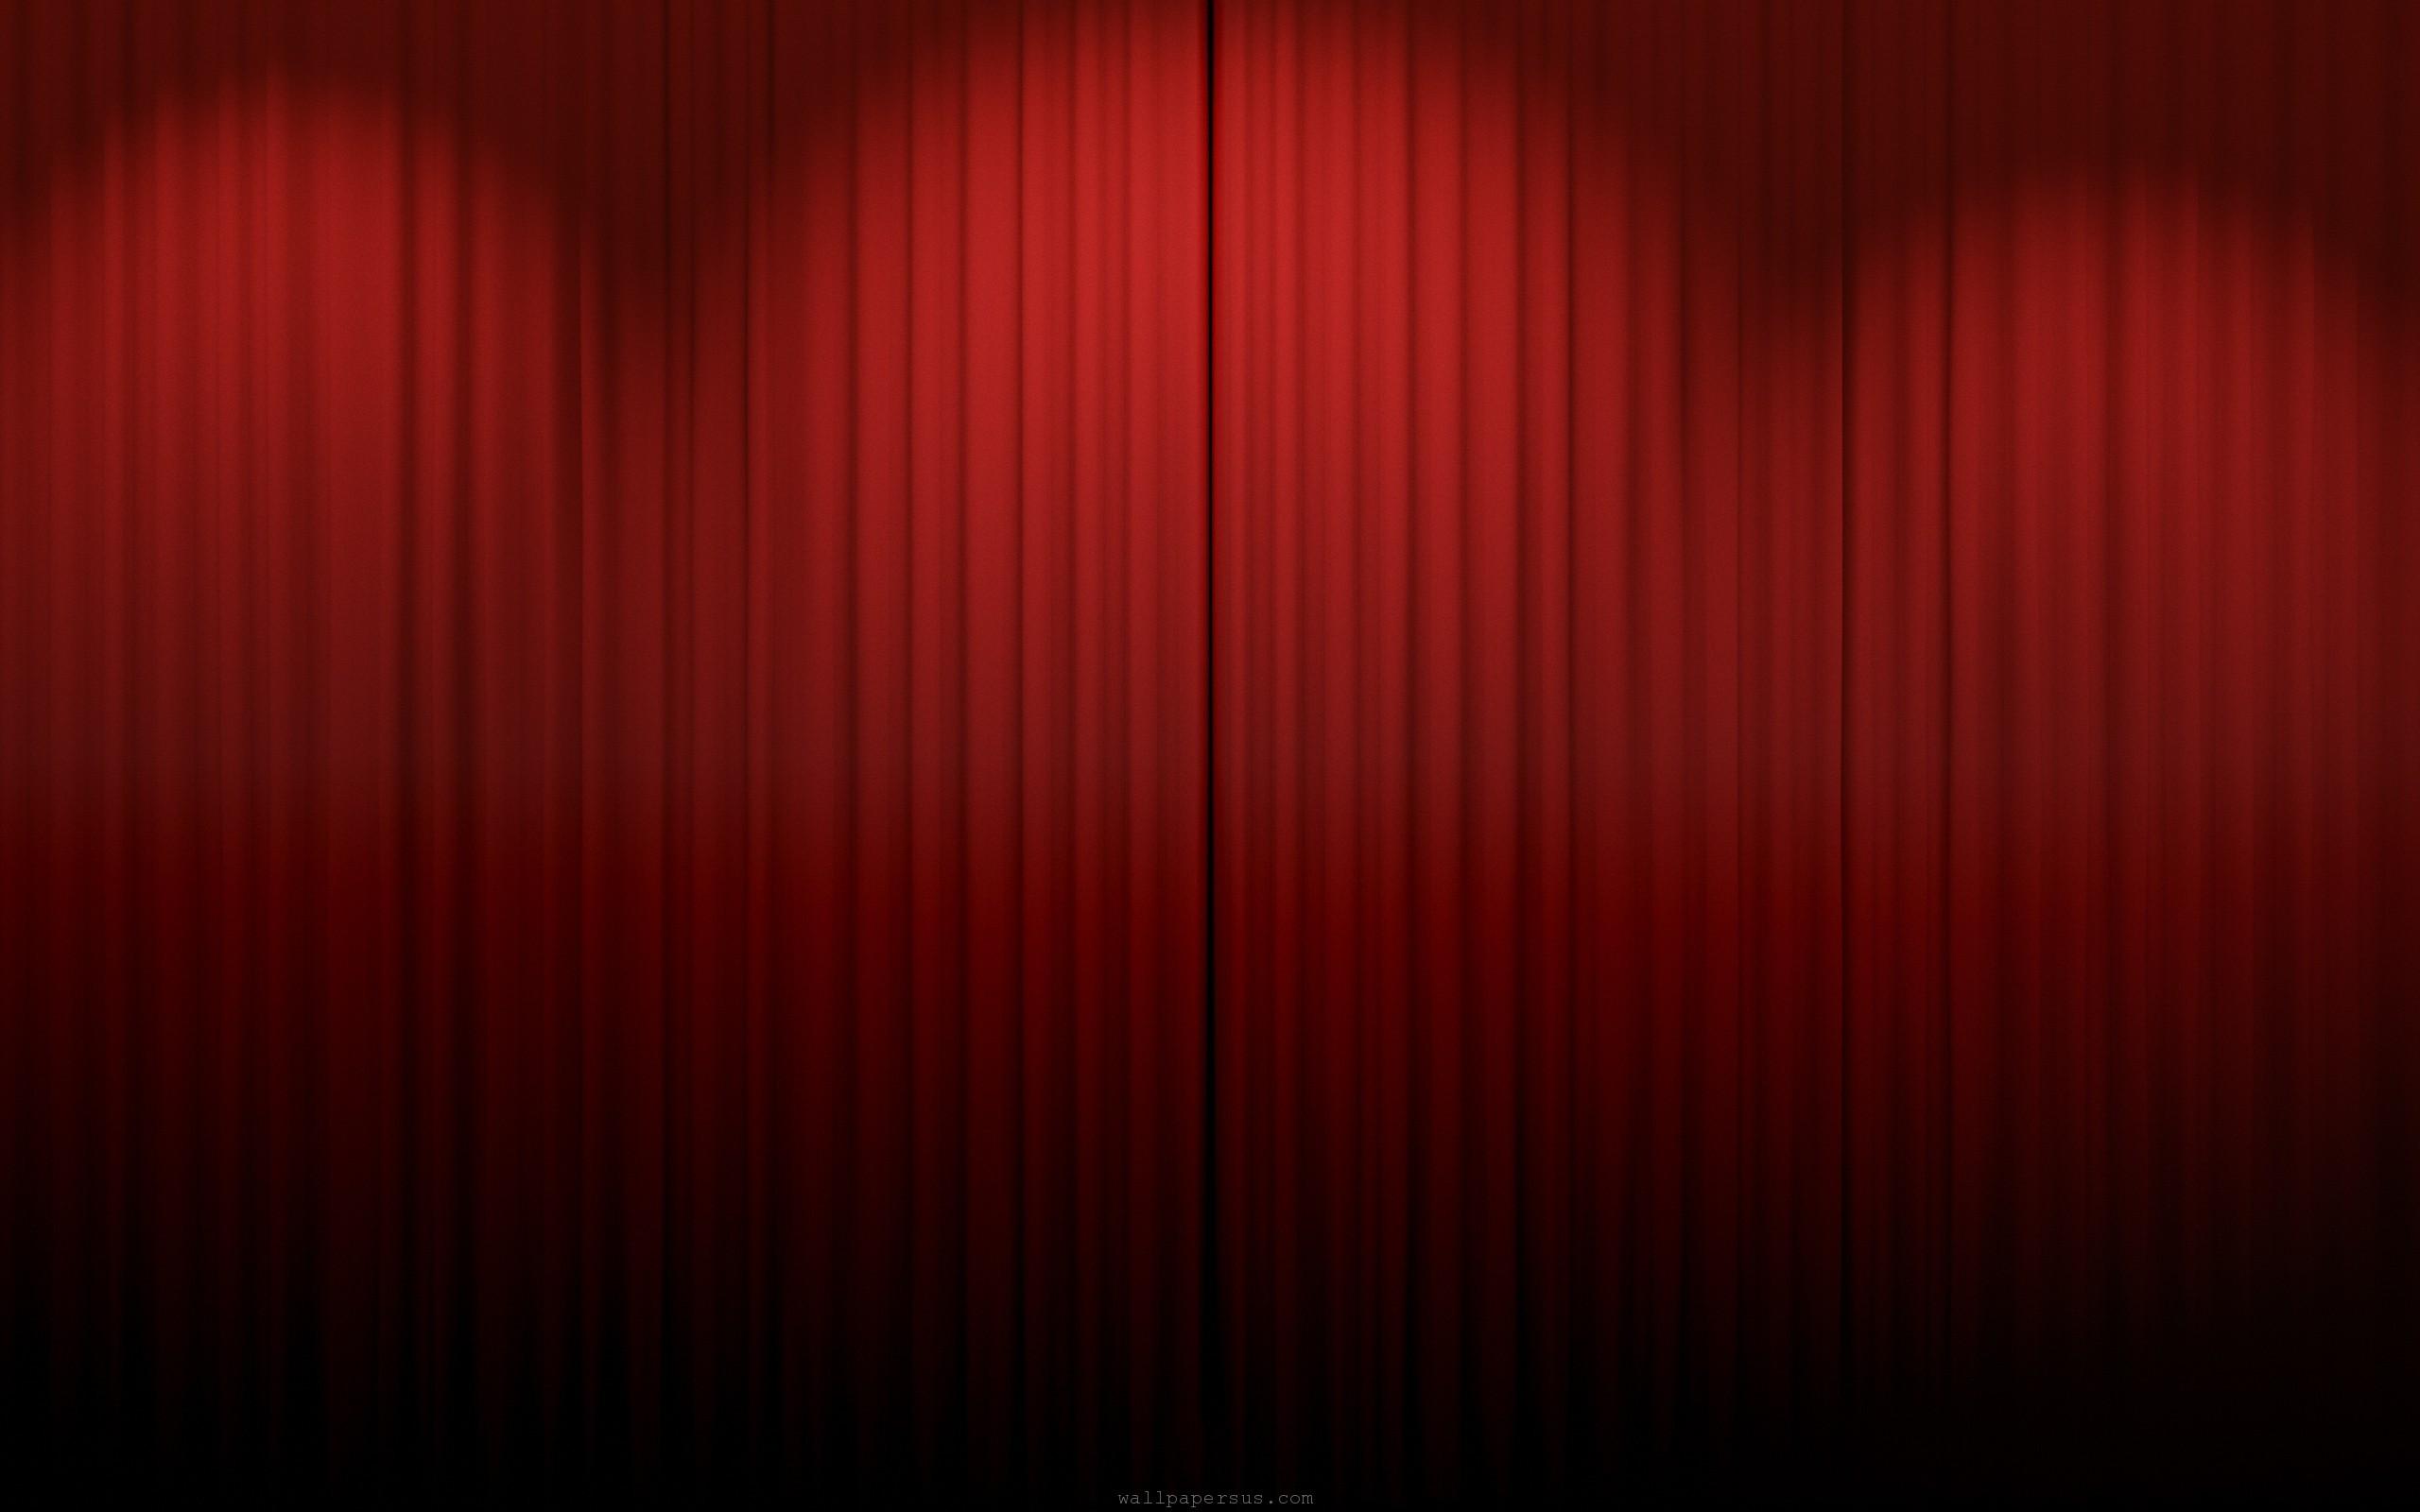 Retro Kitchen Design Red Curtains Long Island Community Theatre Cooperative